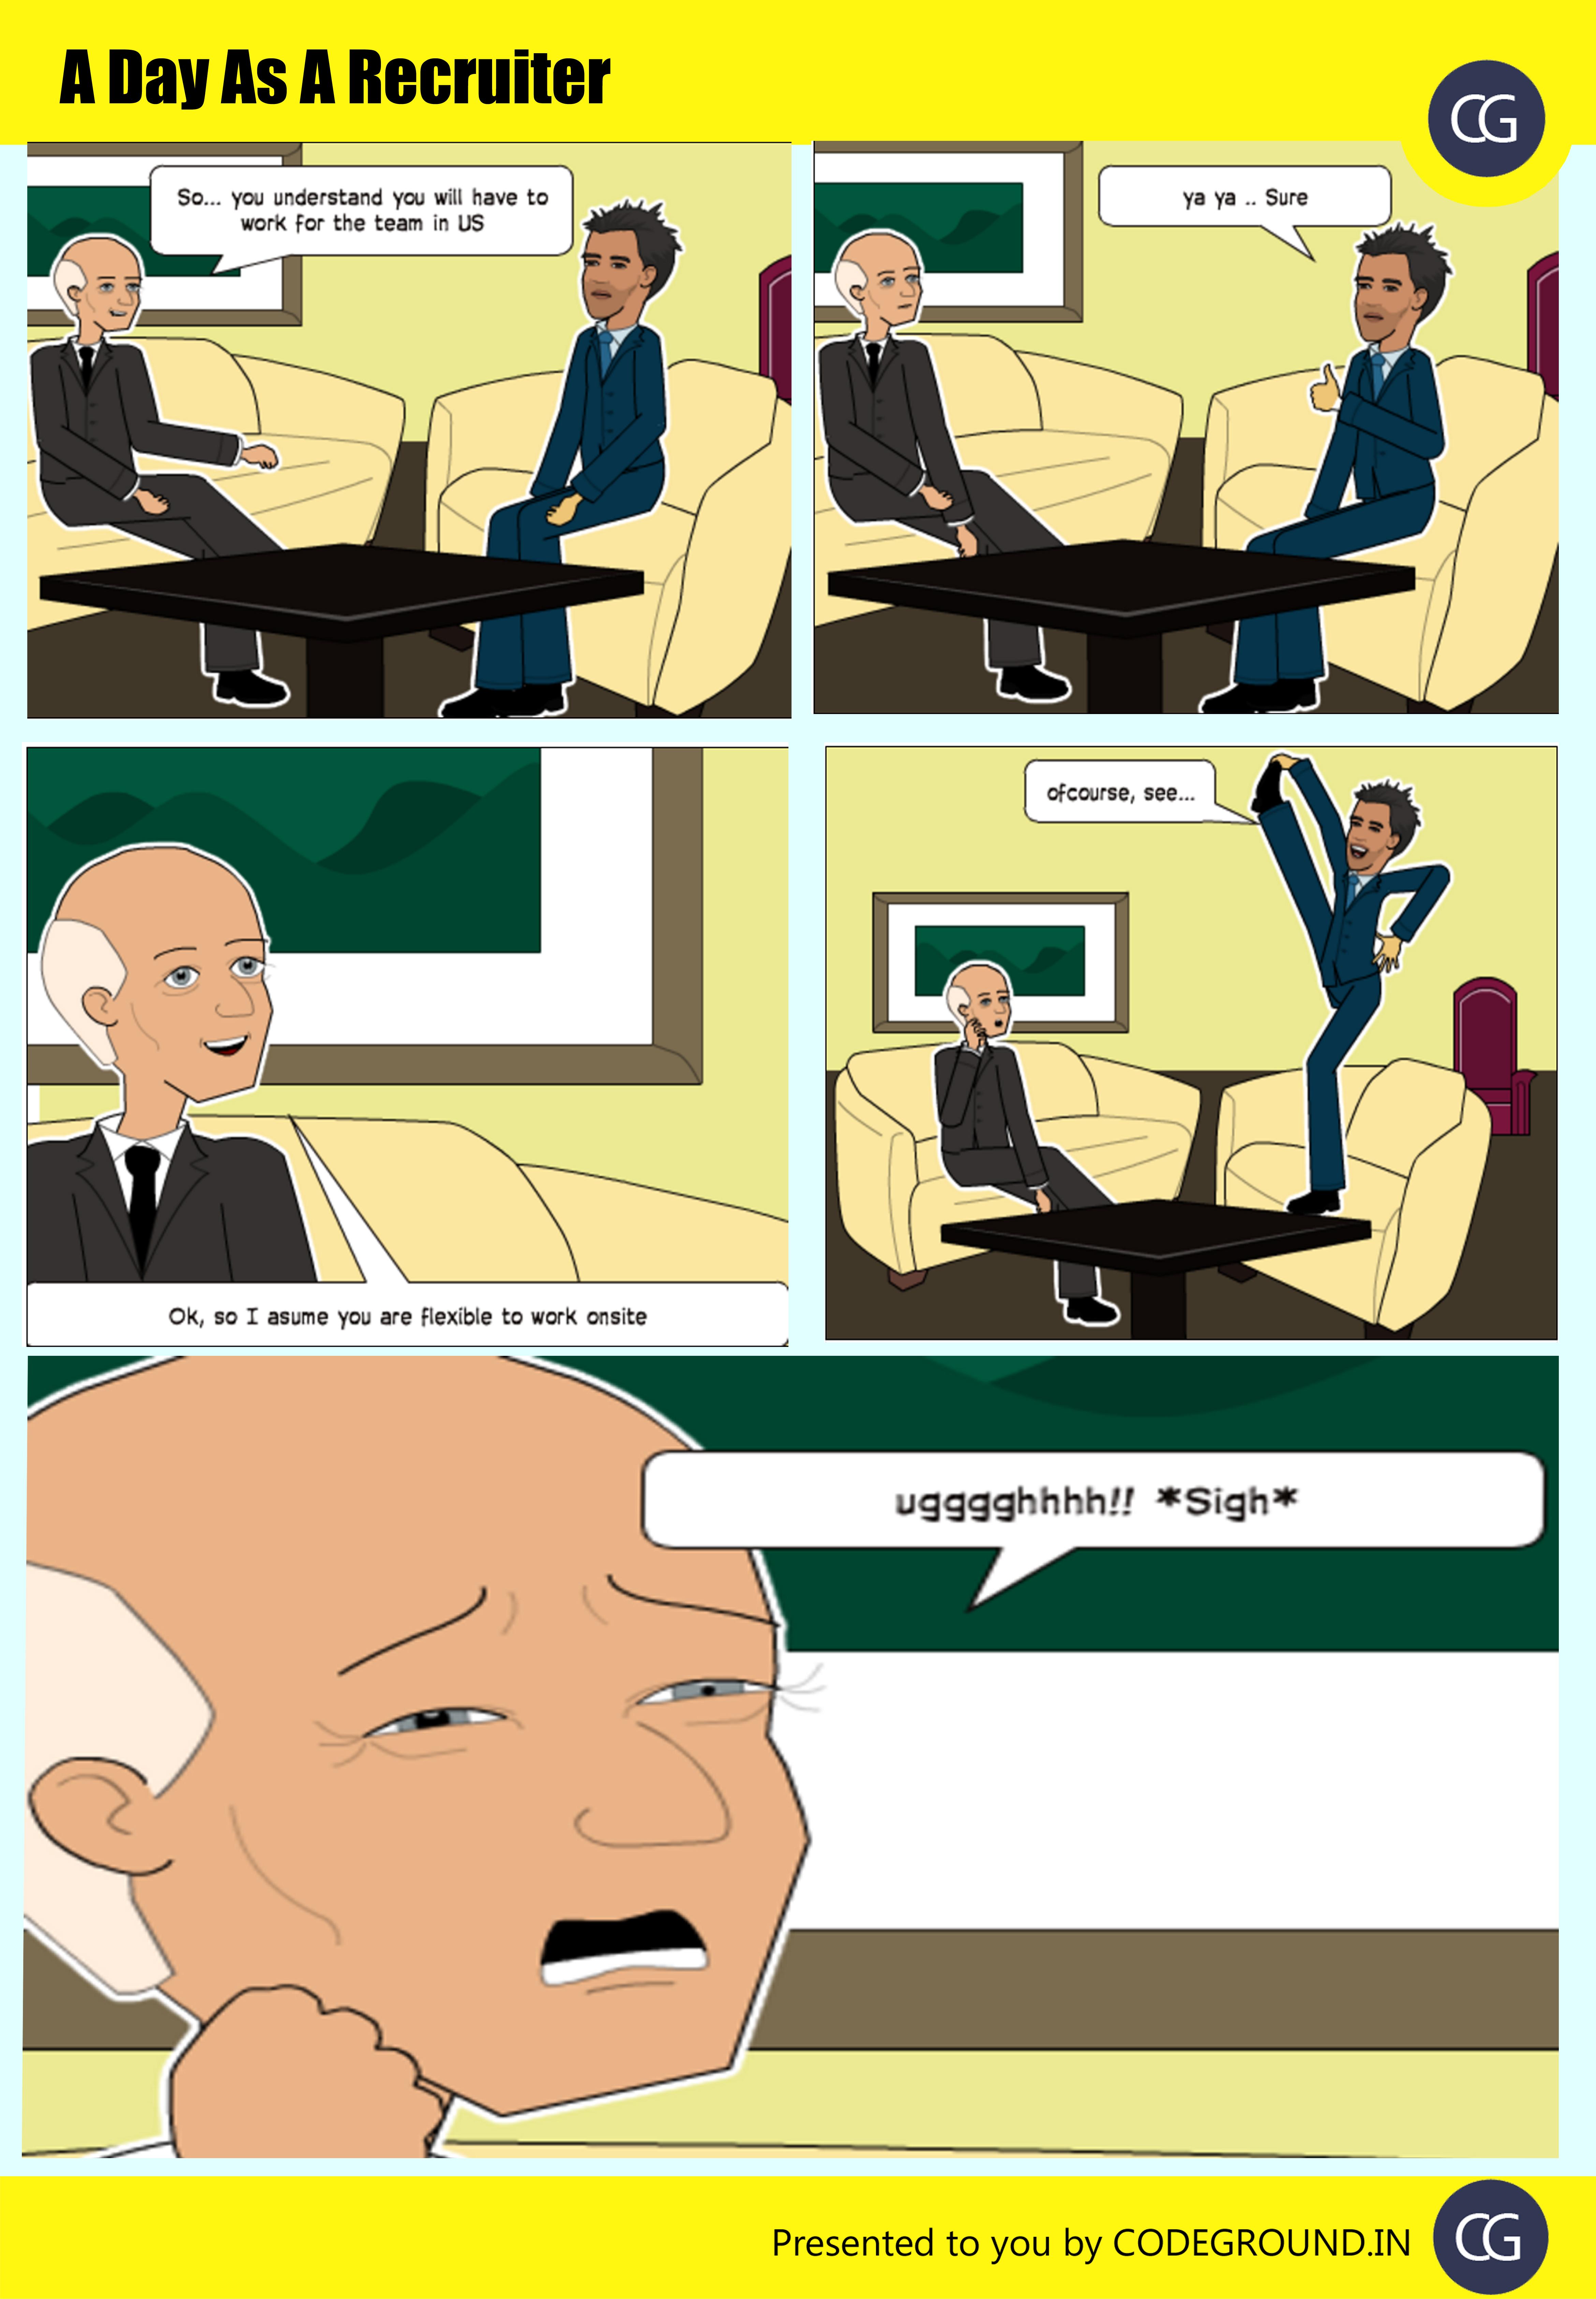 comic-strip-5-a-as-day-recruiter